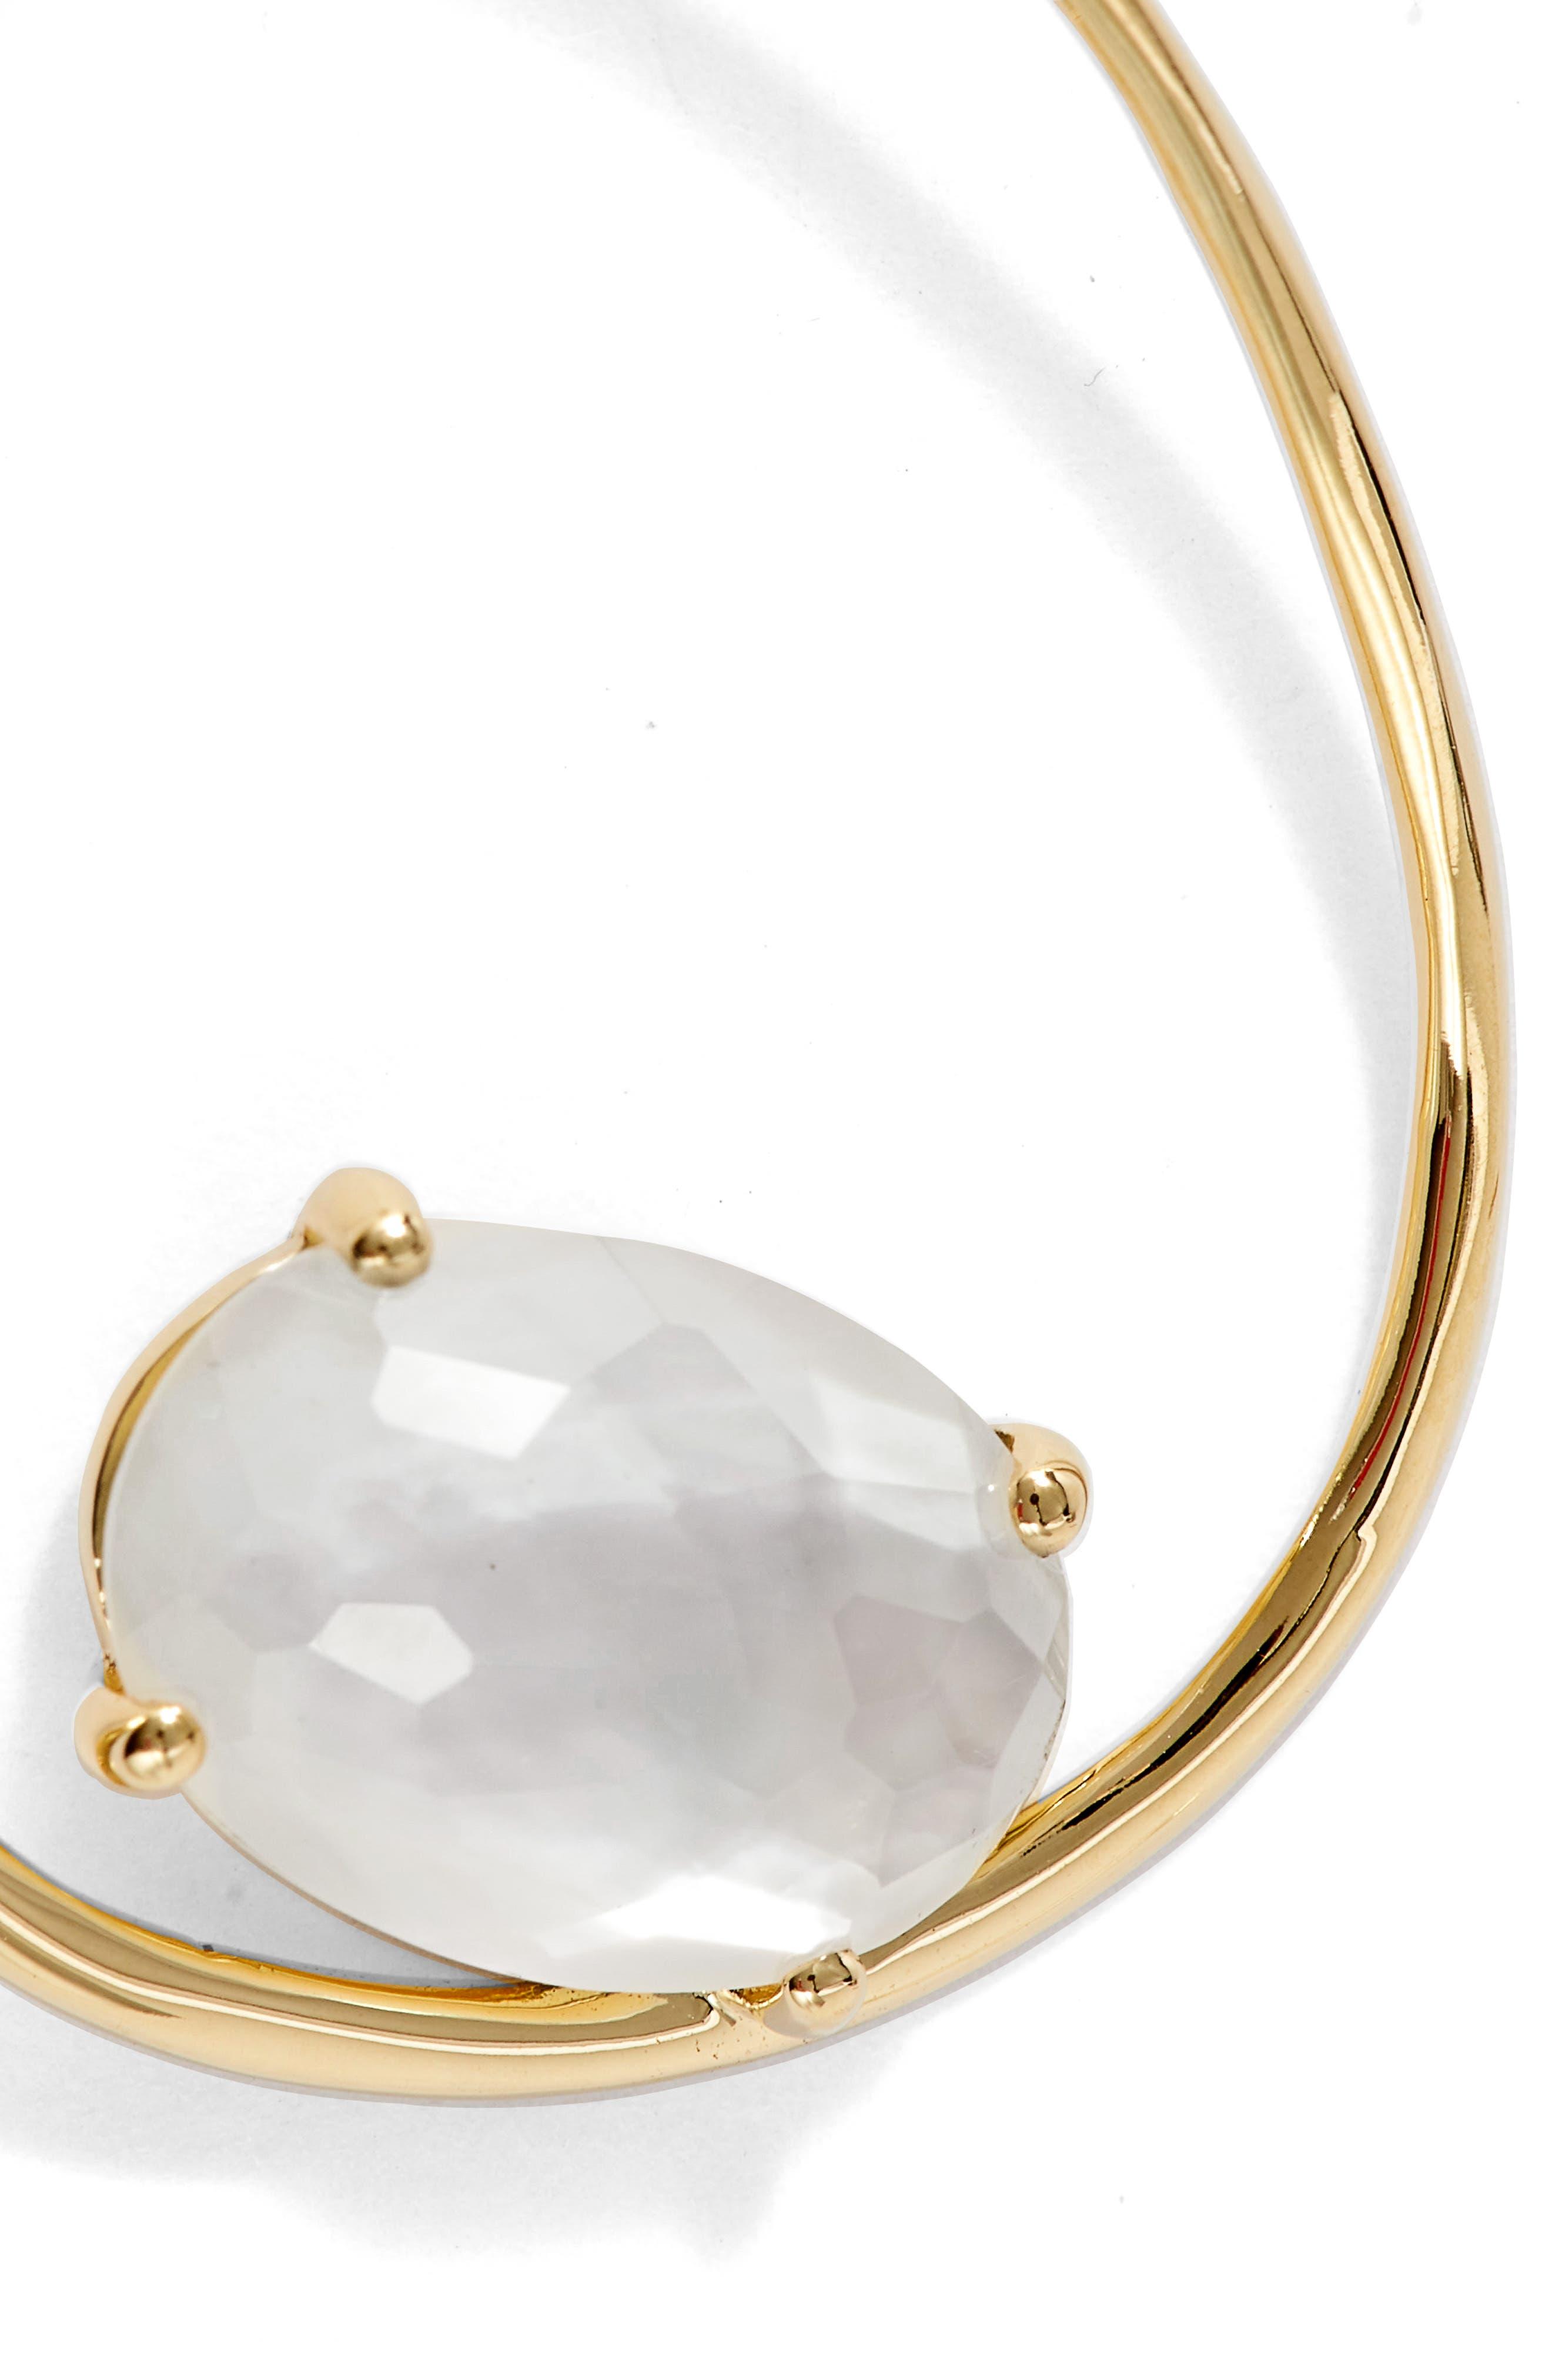 Rock Candy 18K Gold Large Drop Earrings,                             Alternate thumbnail 5, color,                             106